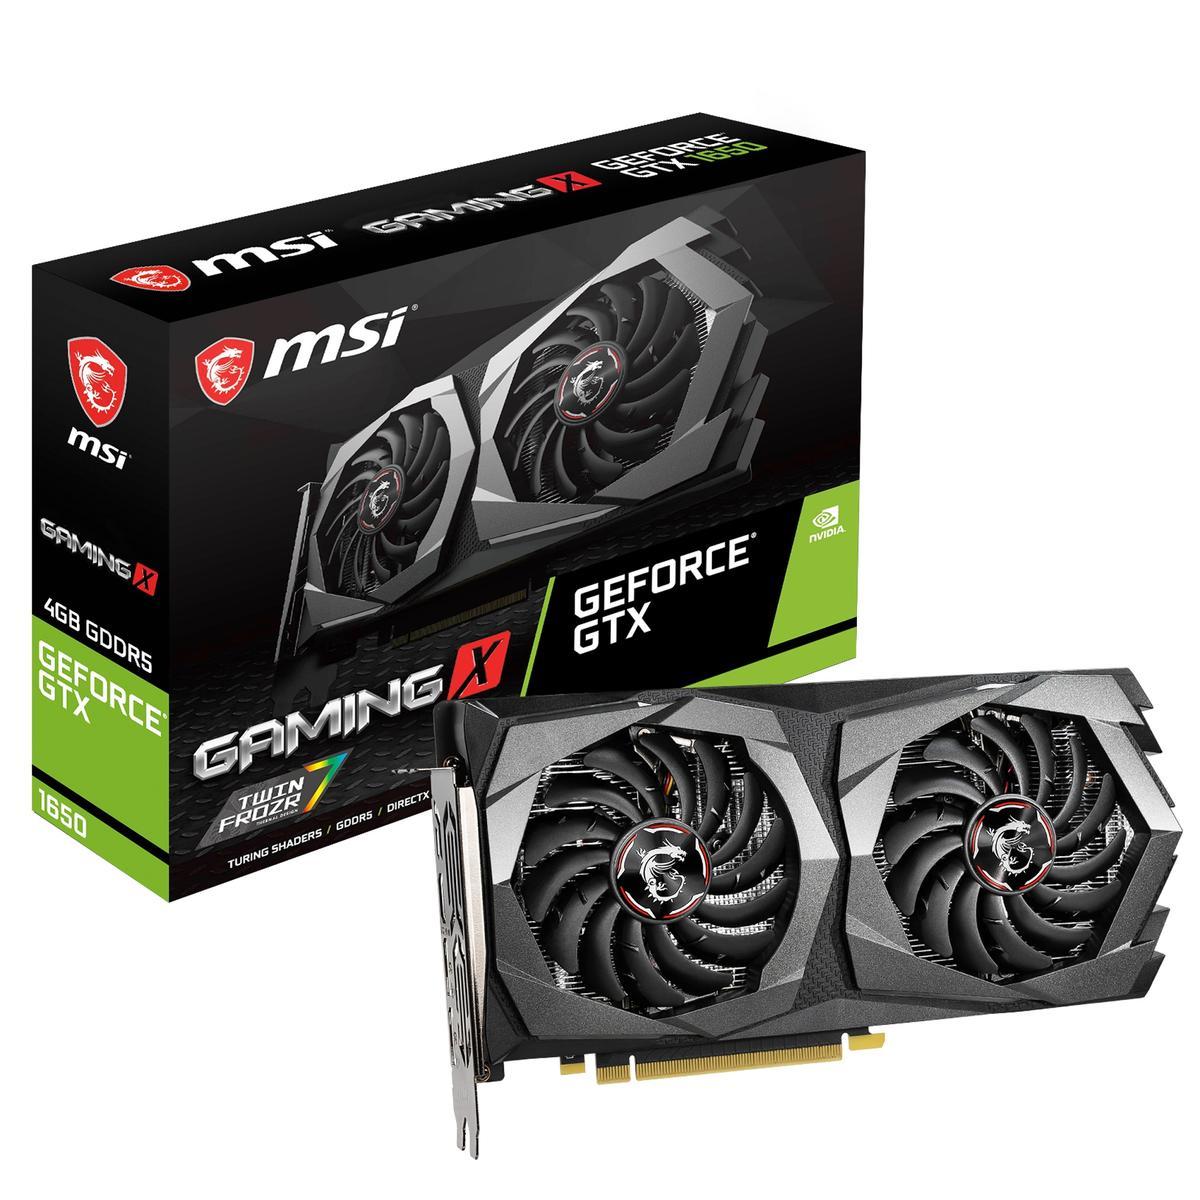 MSI GeForce GTX 1650 4 GB GAMING X Video Card